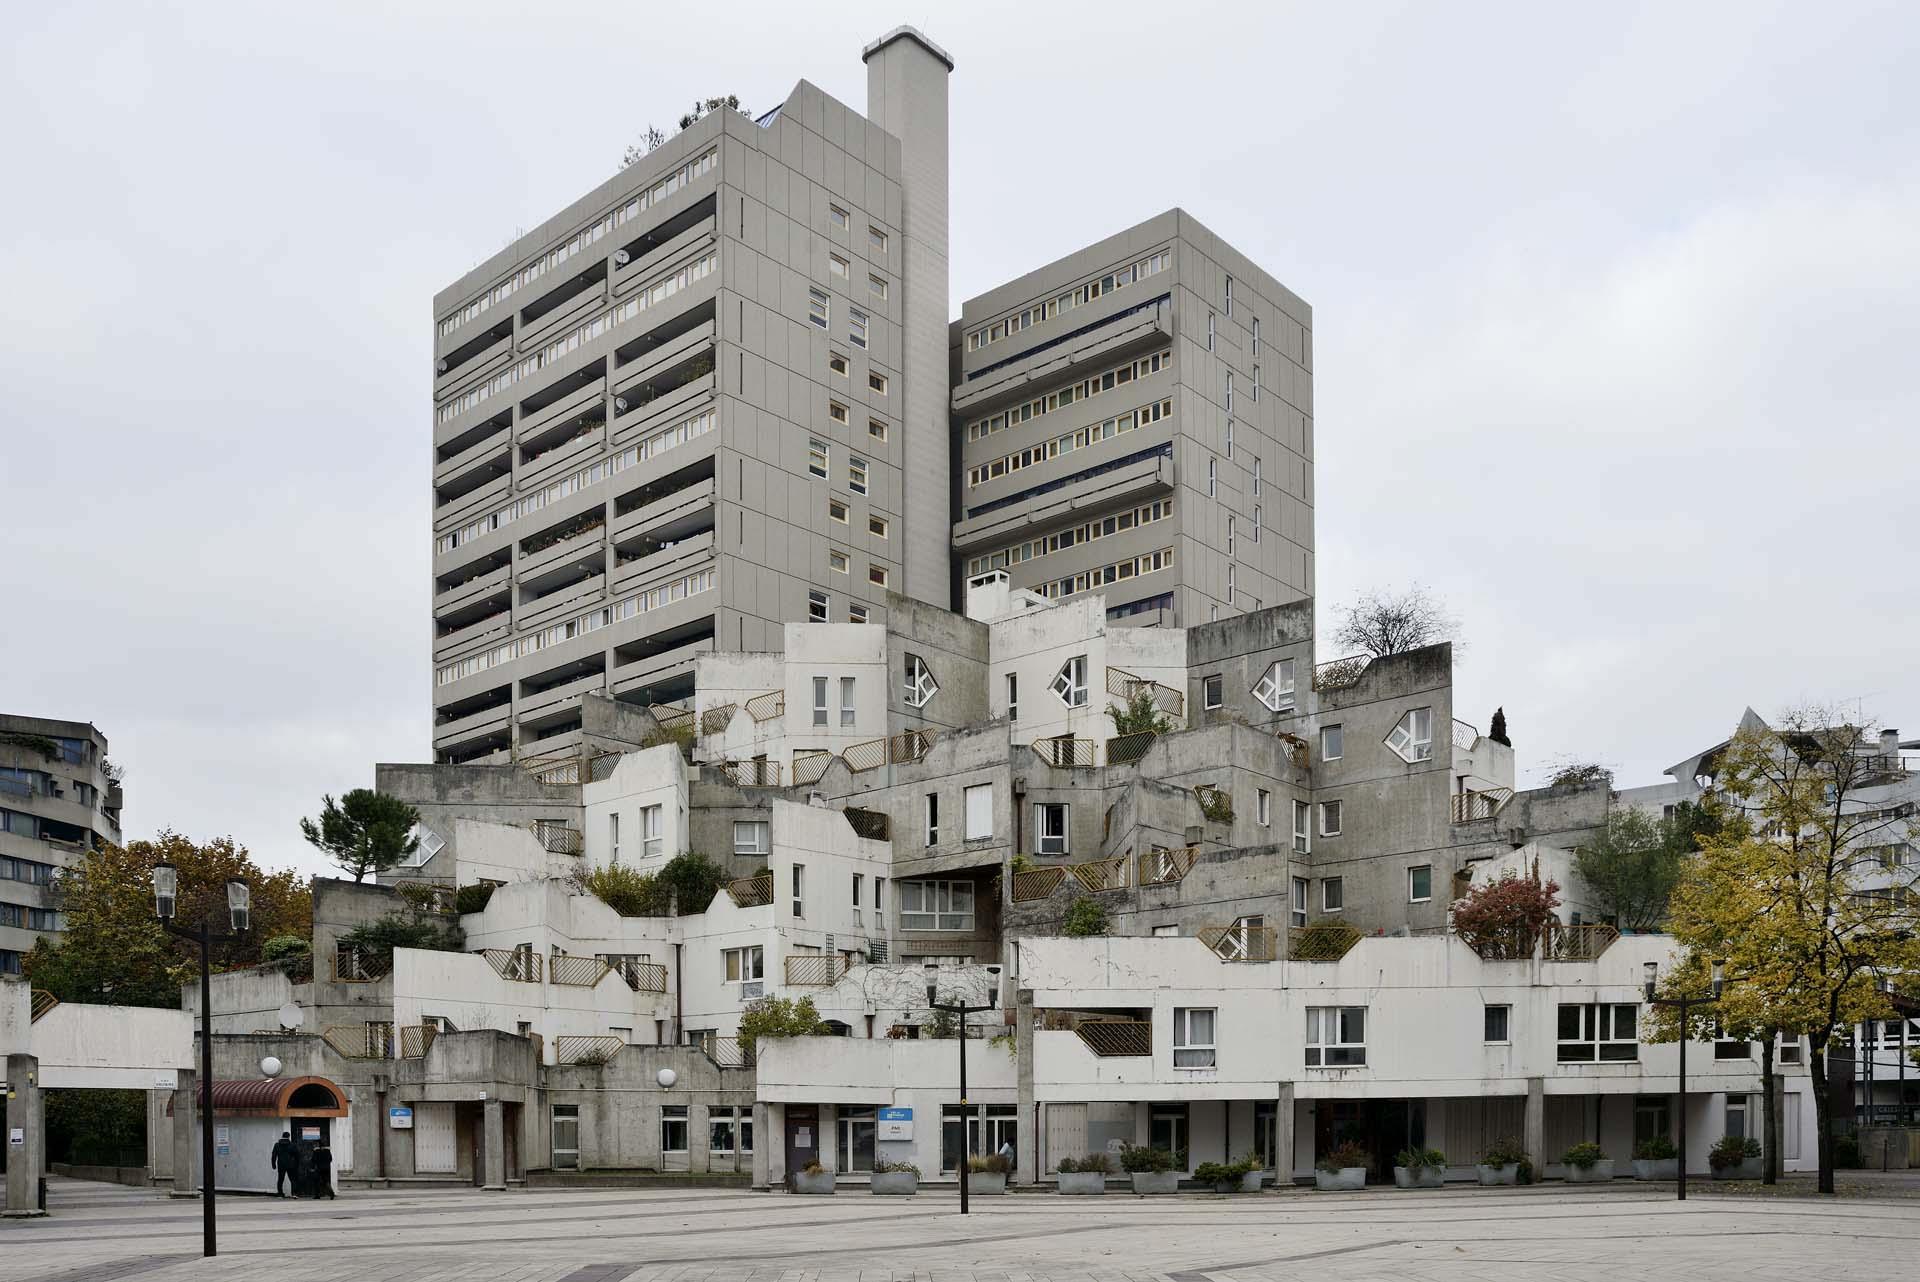 Les Etoiles, Ivry-sur-Seine - Jean Renaudie, Renee Gailhoustet, 1970-72